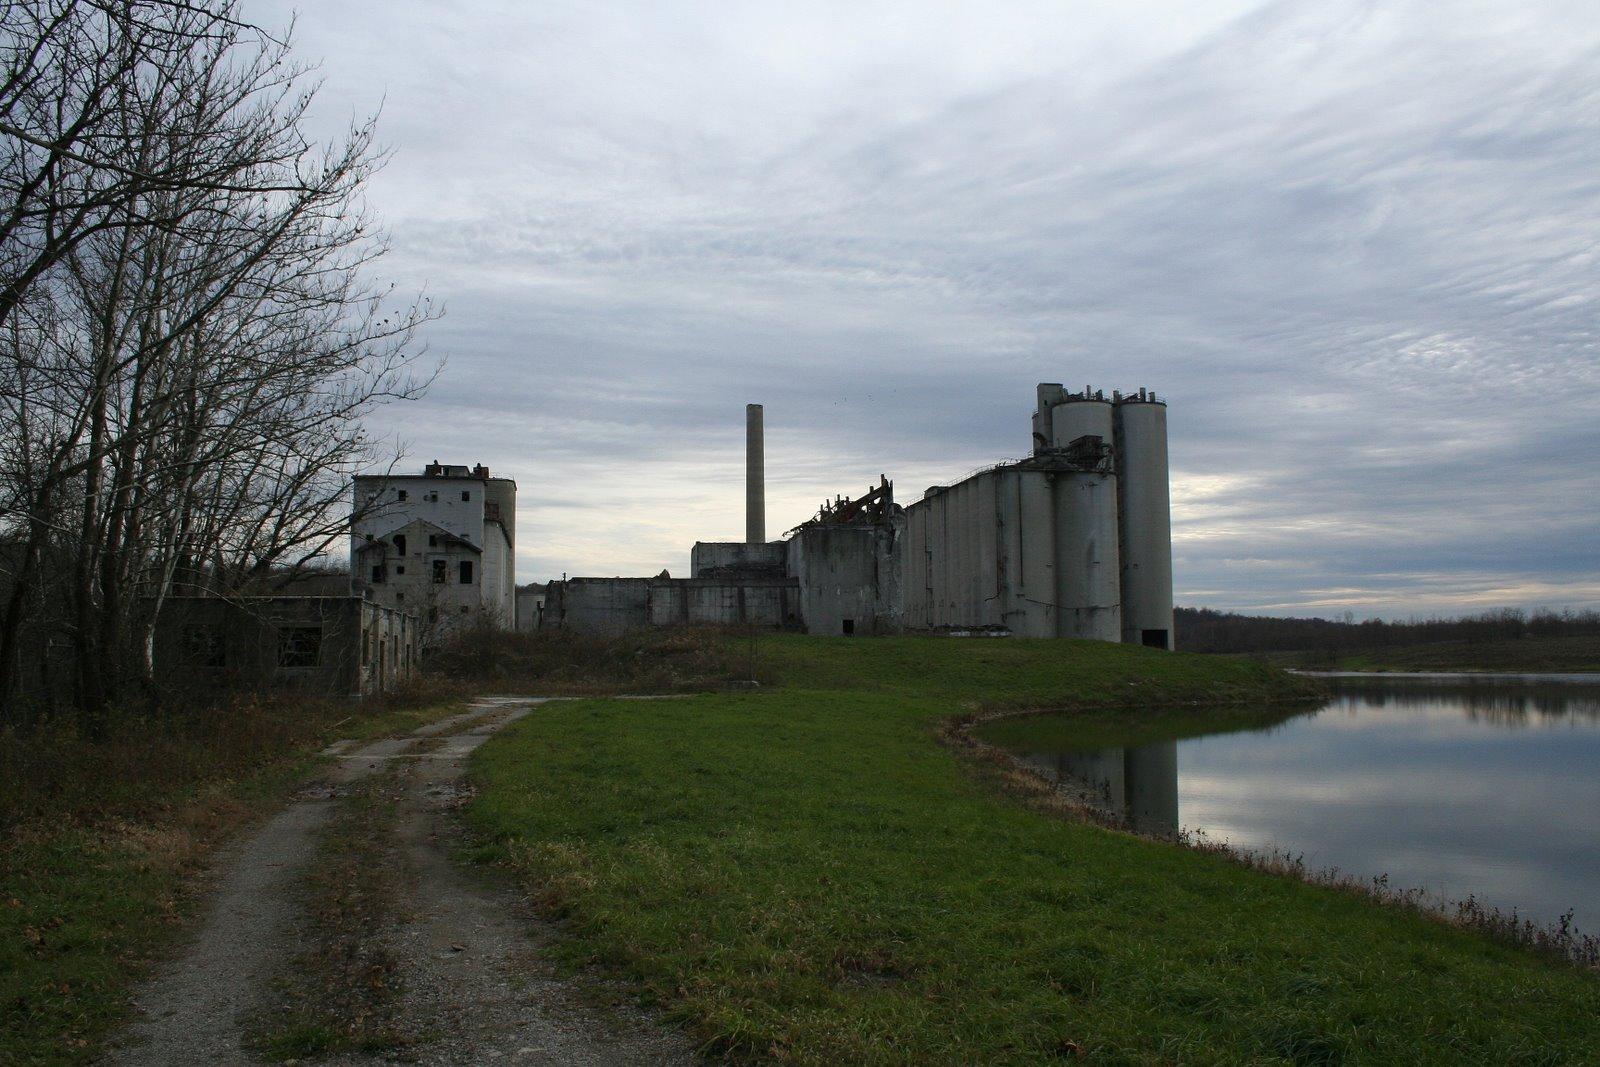 Abandoned Cement Plant : Abandoned cement plant zanesville oh